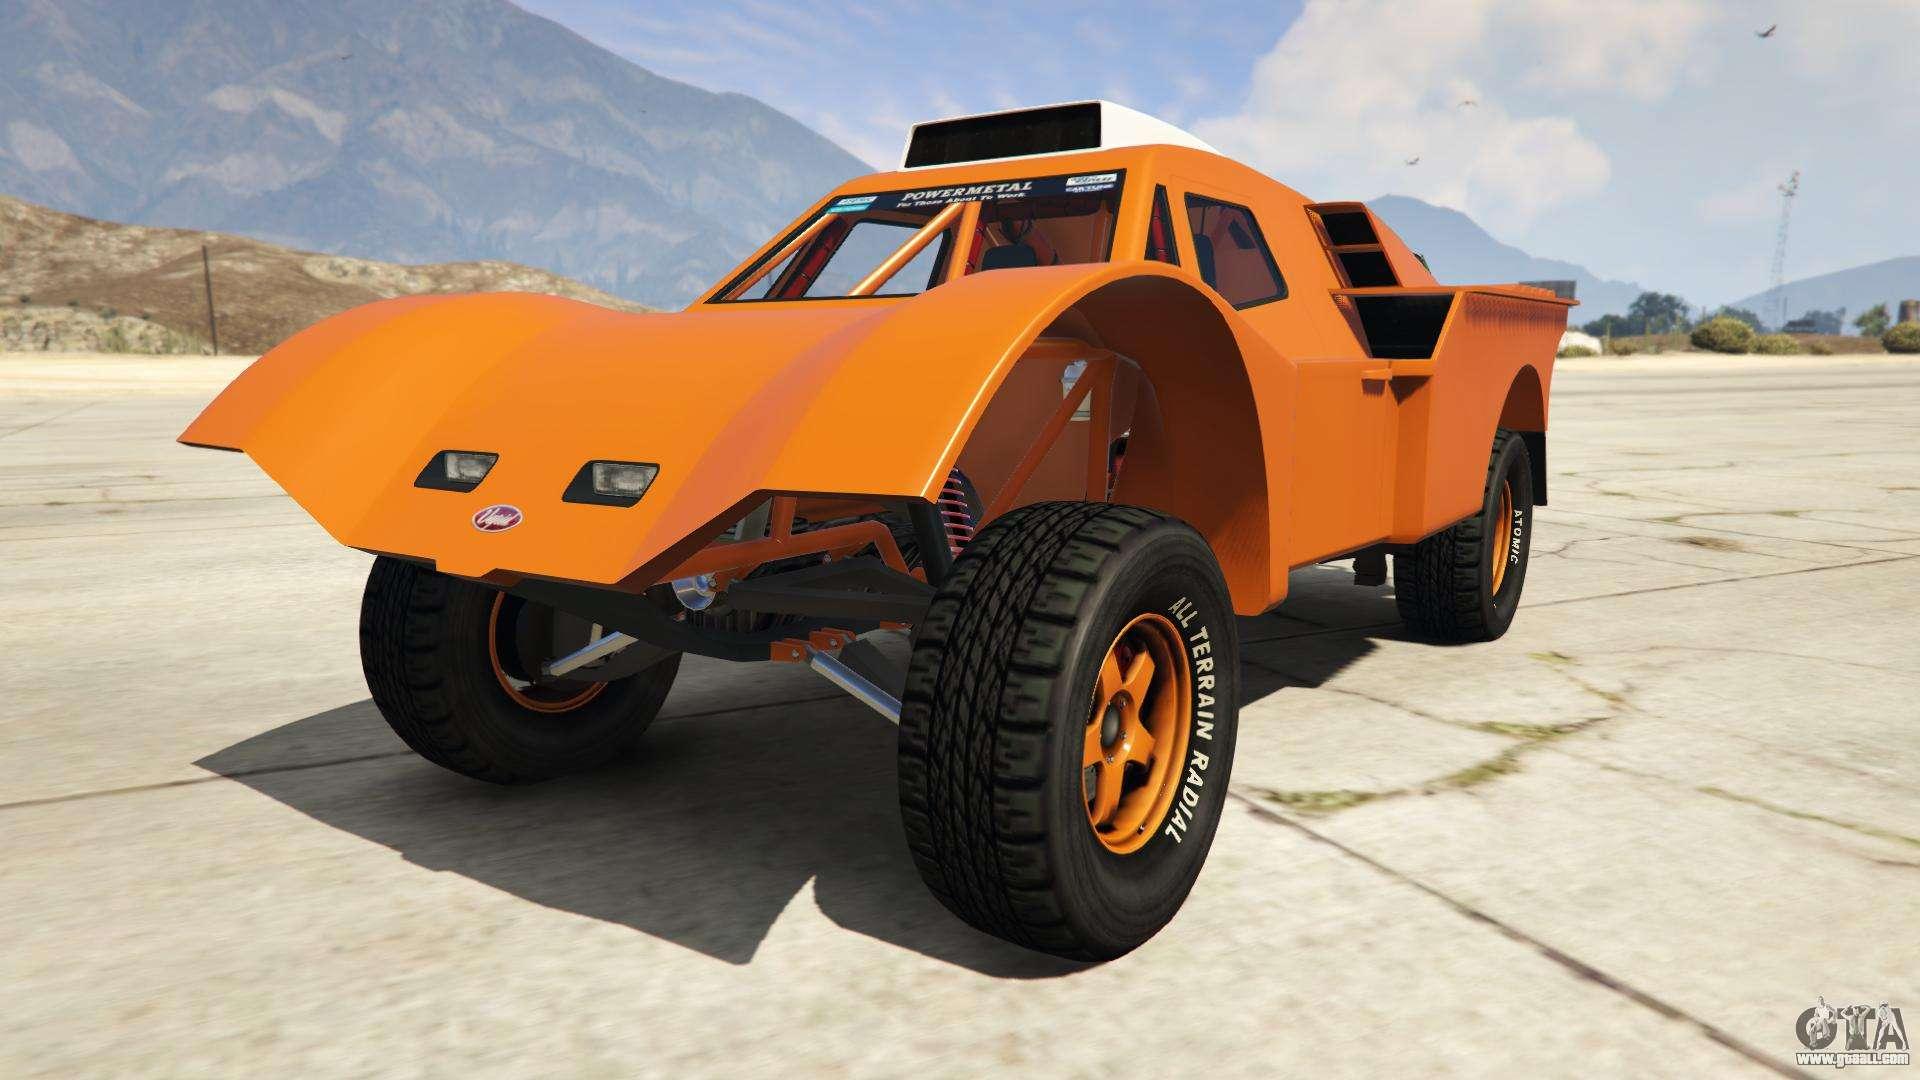 Vapid Desert Raid from GTA Online - front view